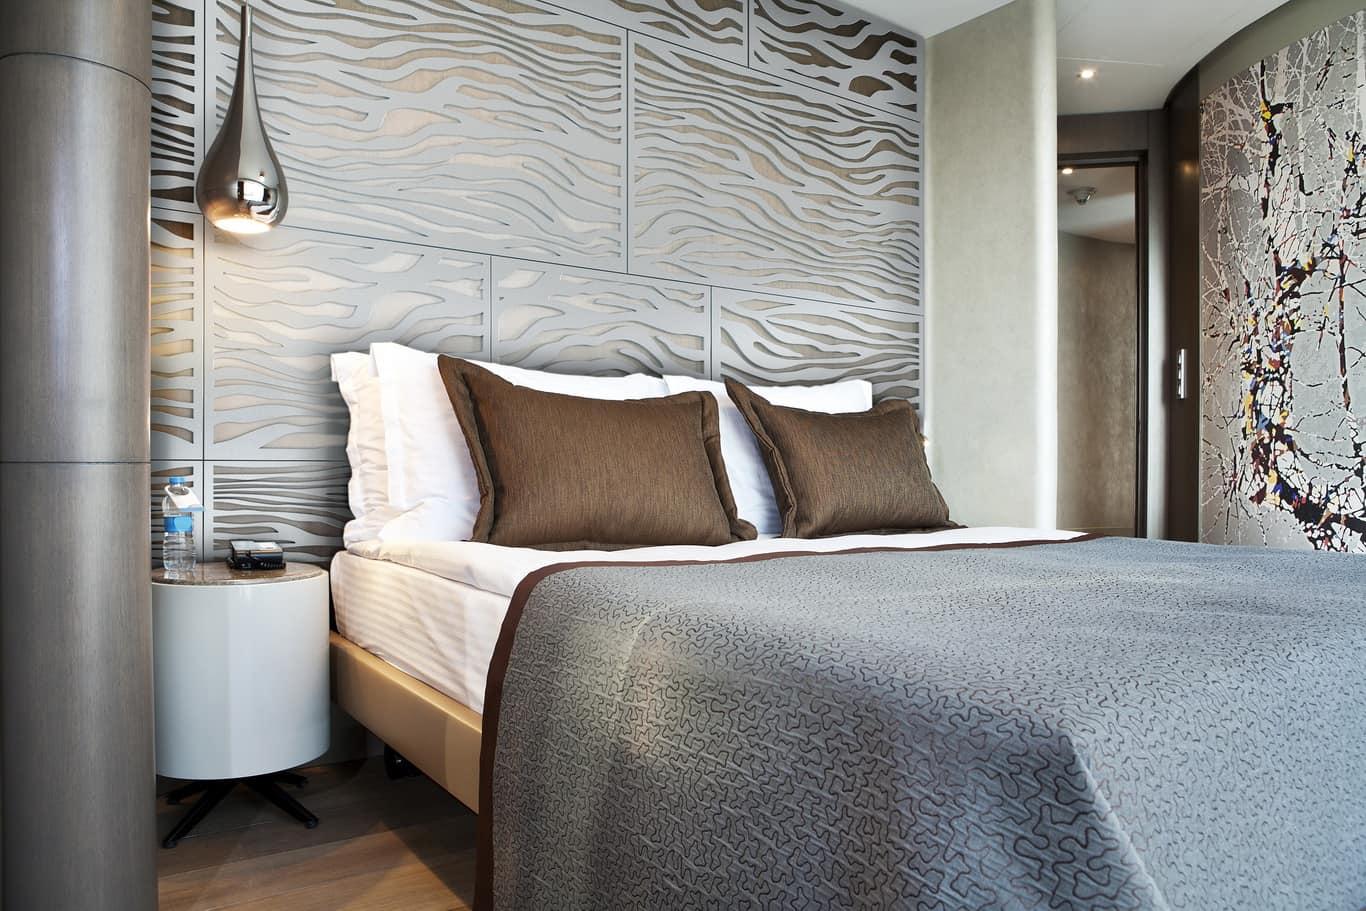 tableaux-decorative-grilles-residential-home-decor-interior-decorating-decorative-accent-elements-arcola-920-platinum-591-001.jpg